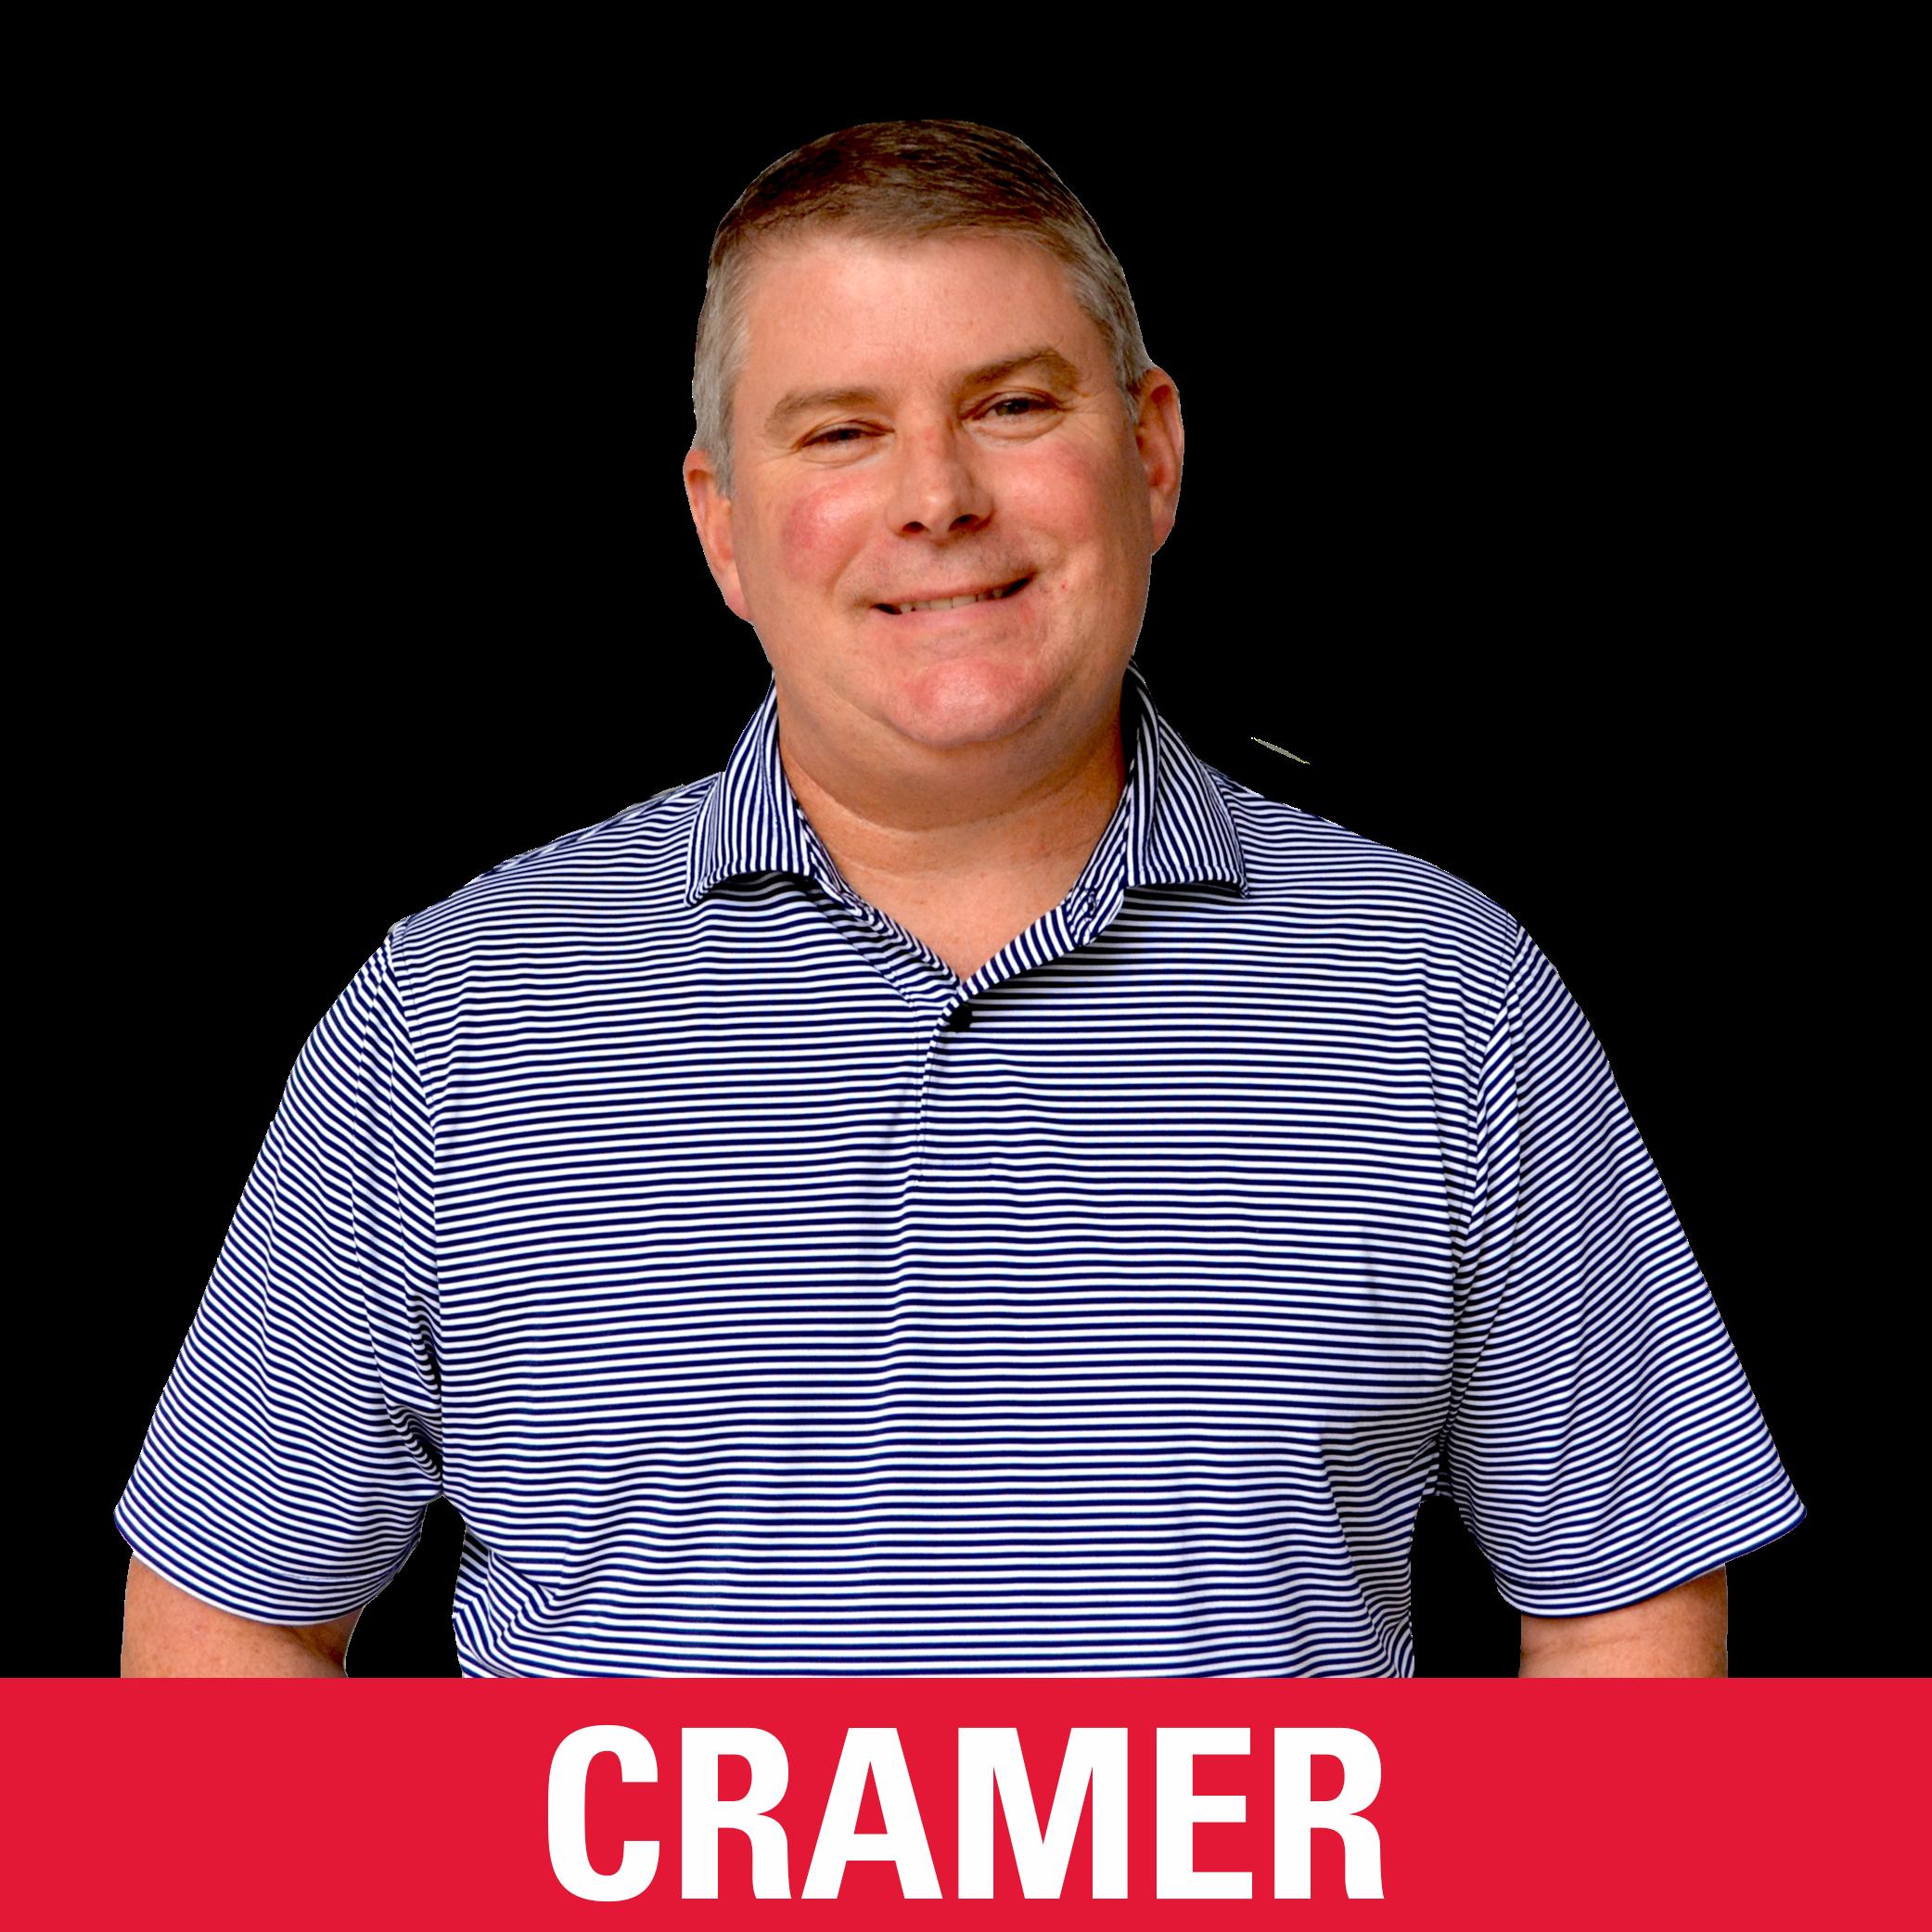 Huddle_Bob Cramer.png